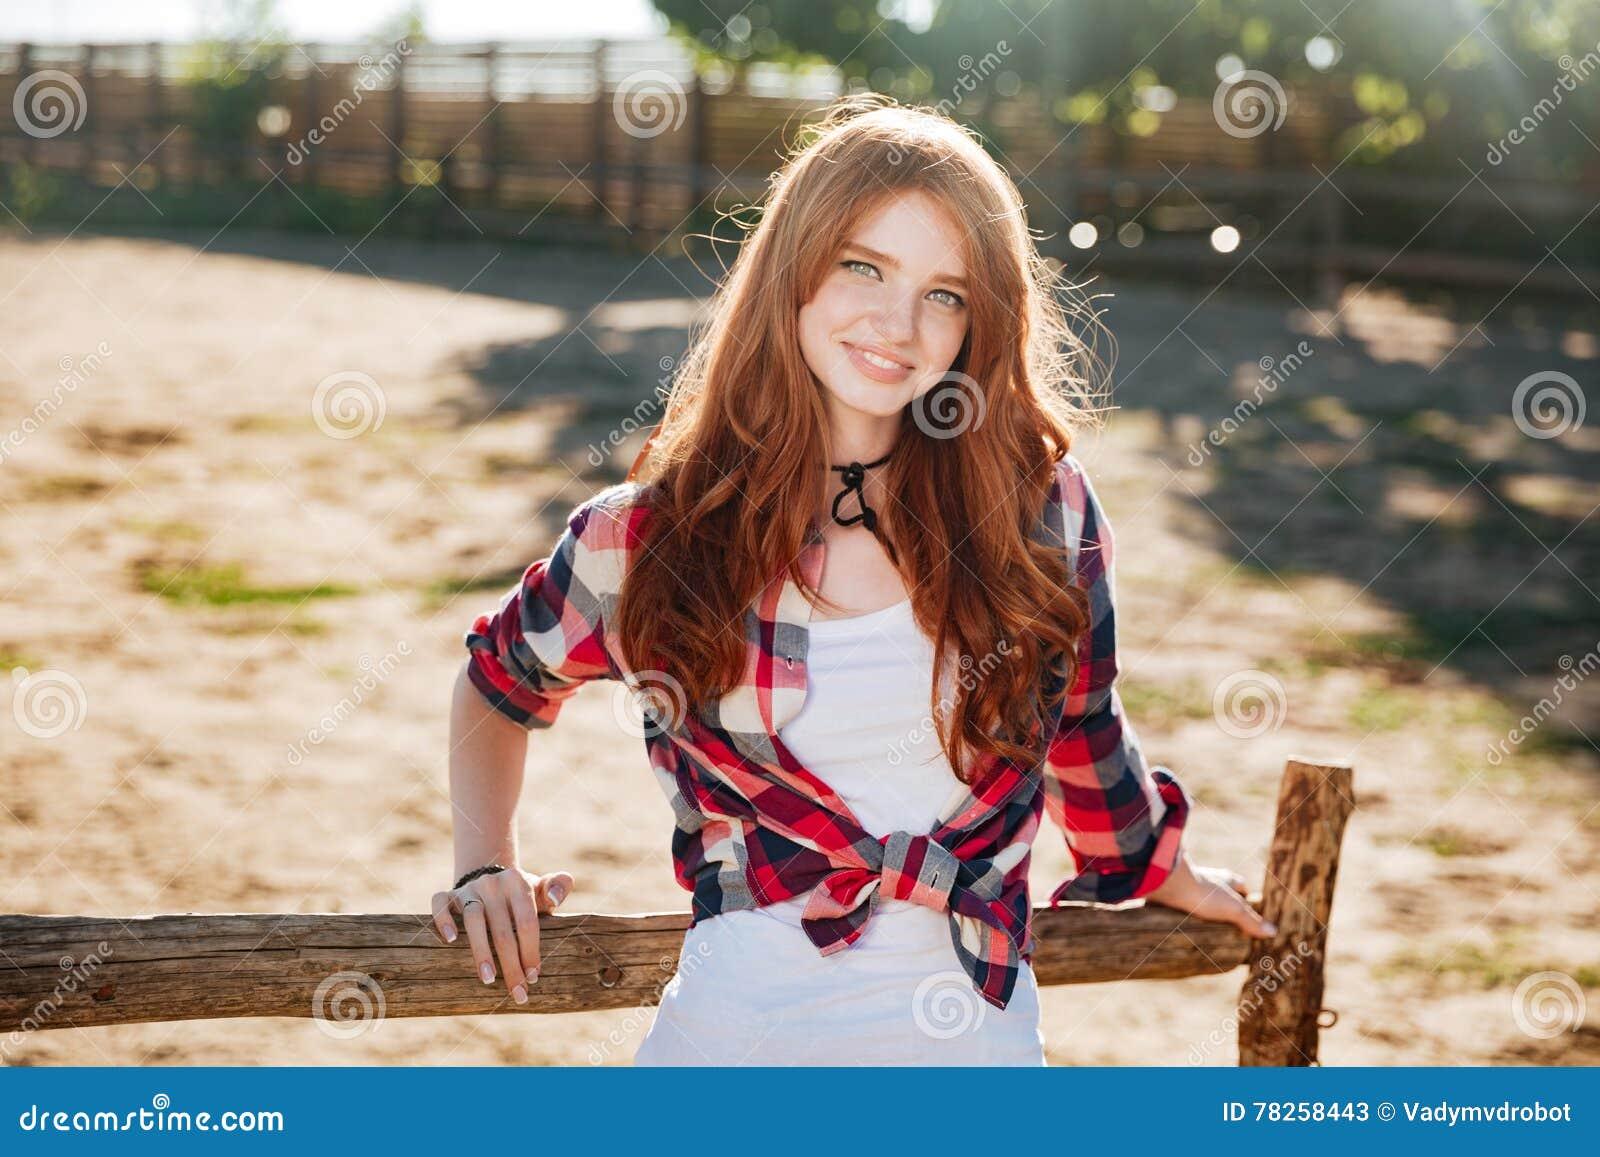 Sweet redhead cowgirl free bend